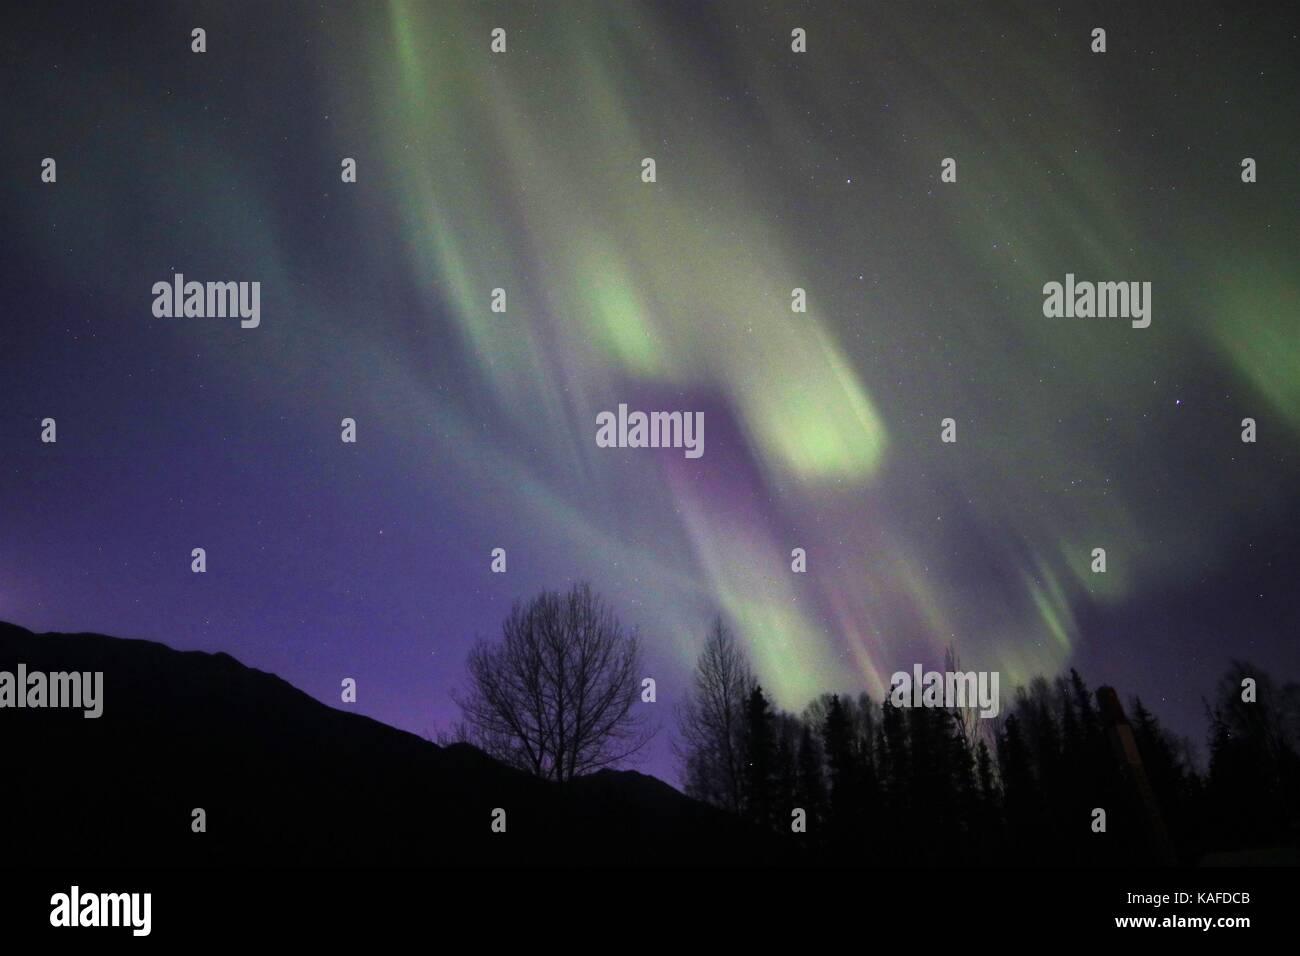 Aurora Borealis lights up the night sky - Stock Image